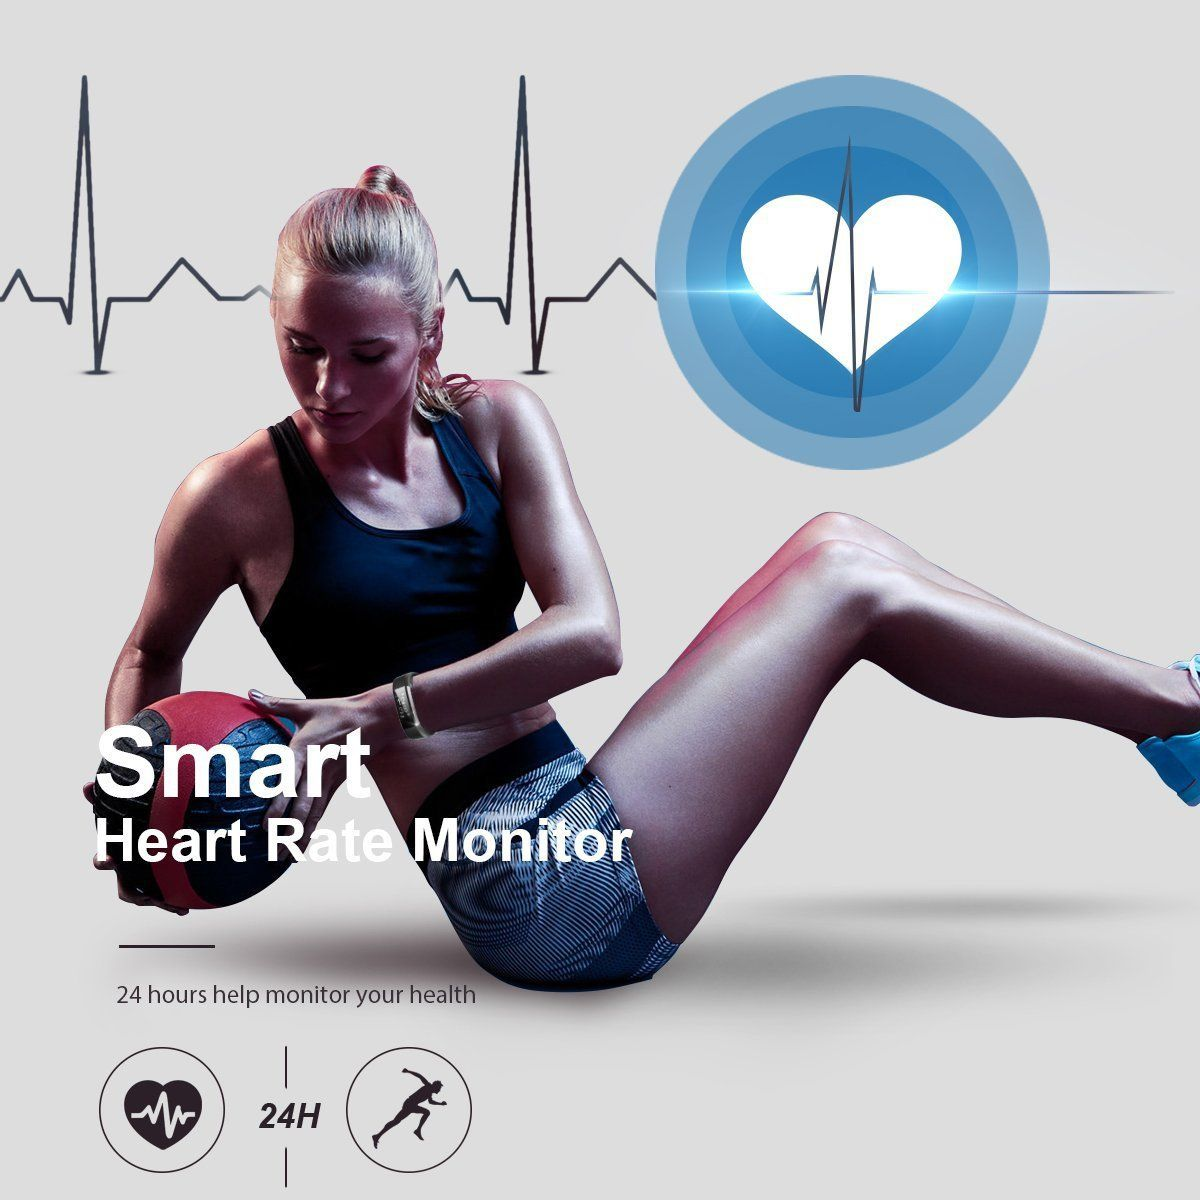 Fitness tracker waterproof activity tracker heart rate